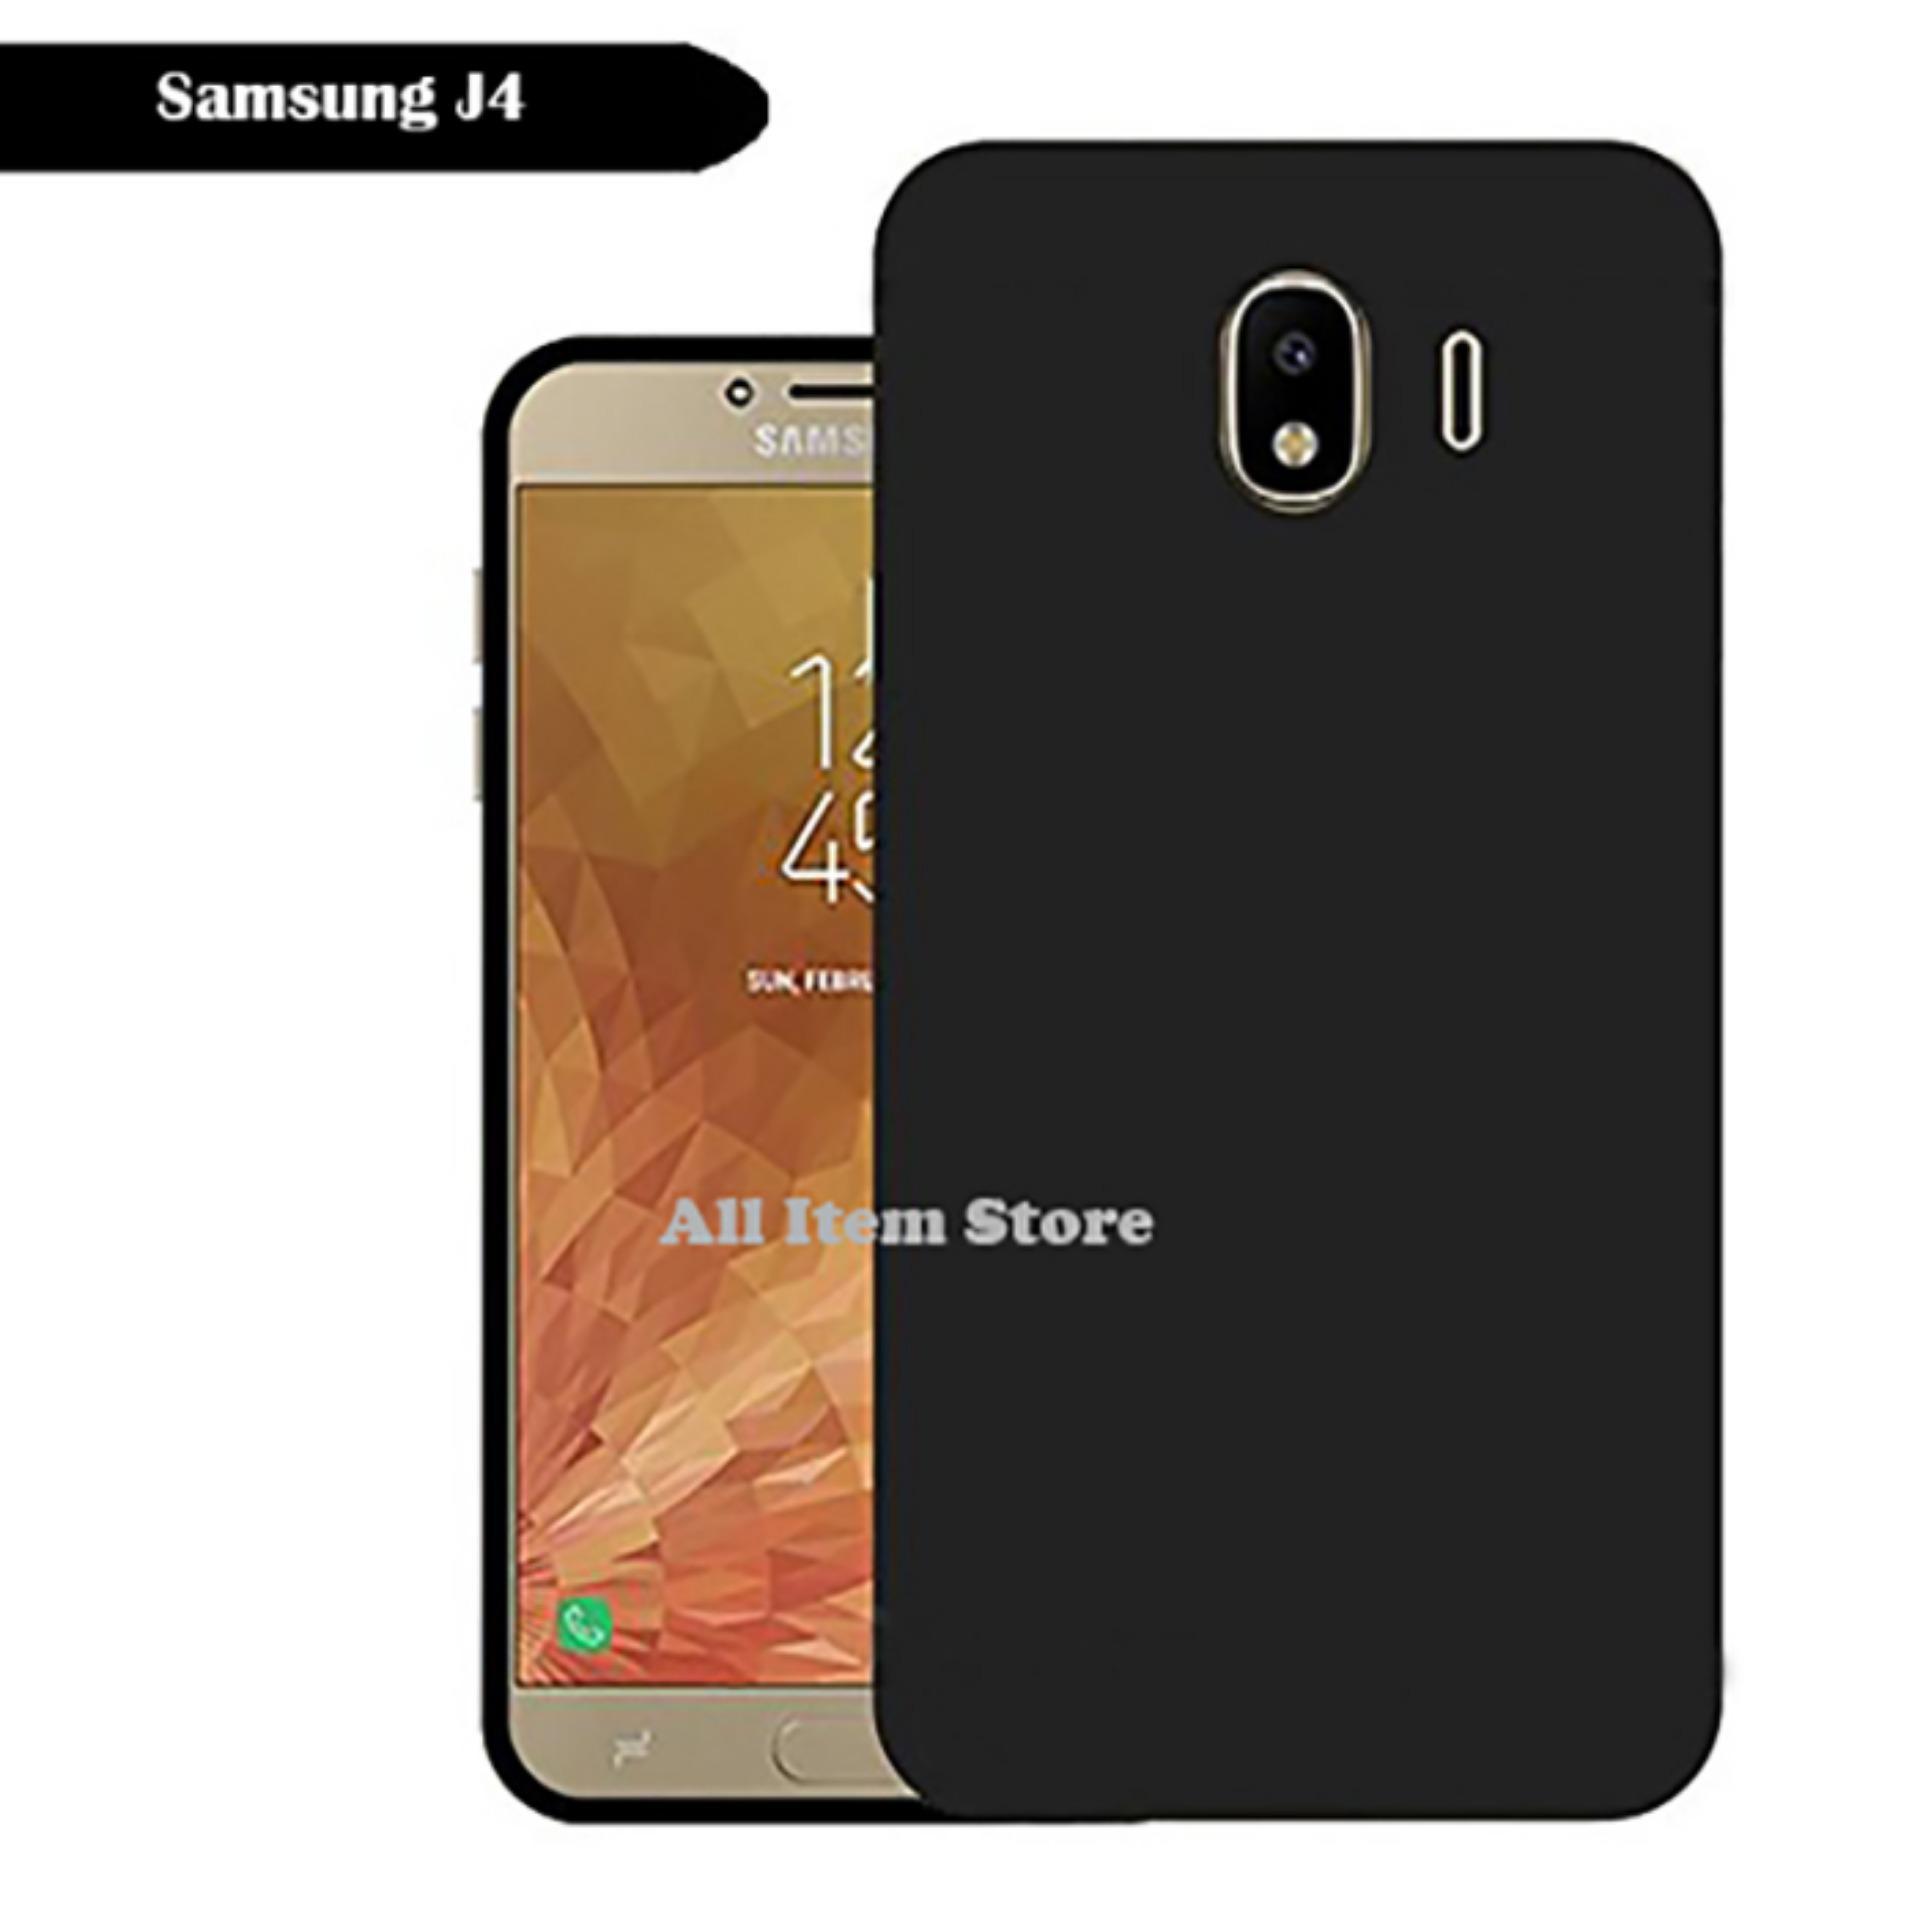 Case Slim Black Matte Samsung Galaxy J4 Baby Skin Softcase Ultra Thin Jelly Silikon Babyskin - Hita